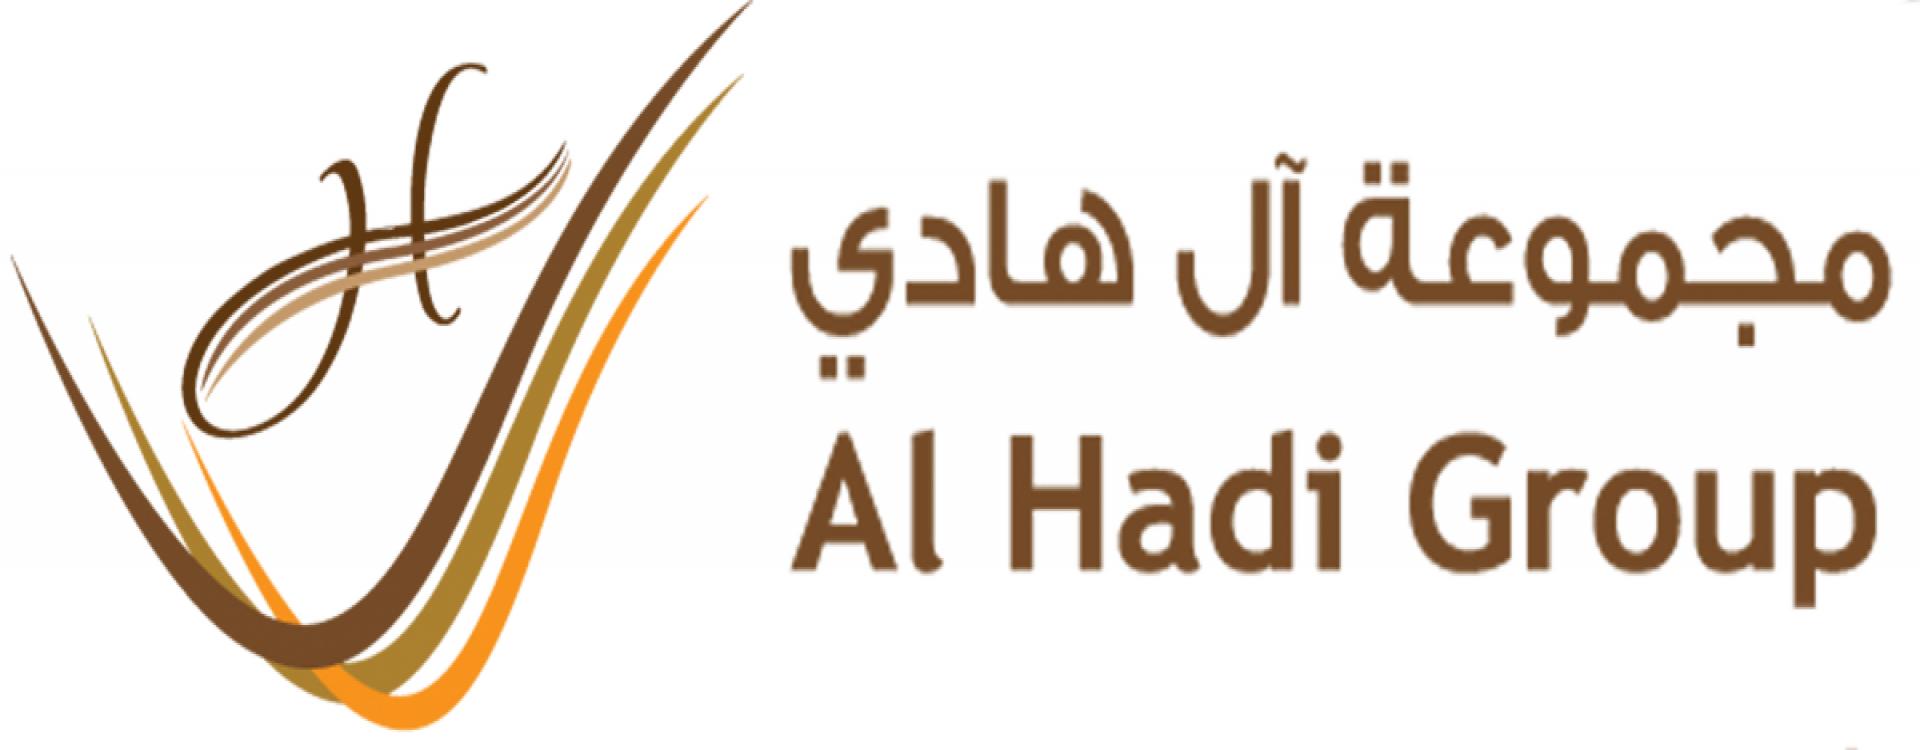 alhadi group